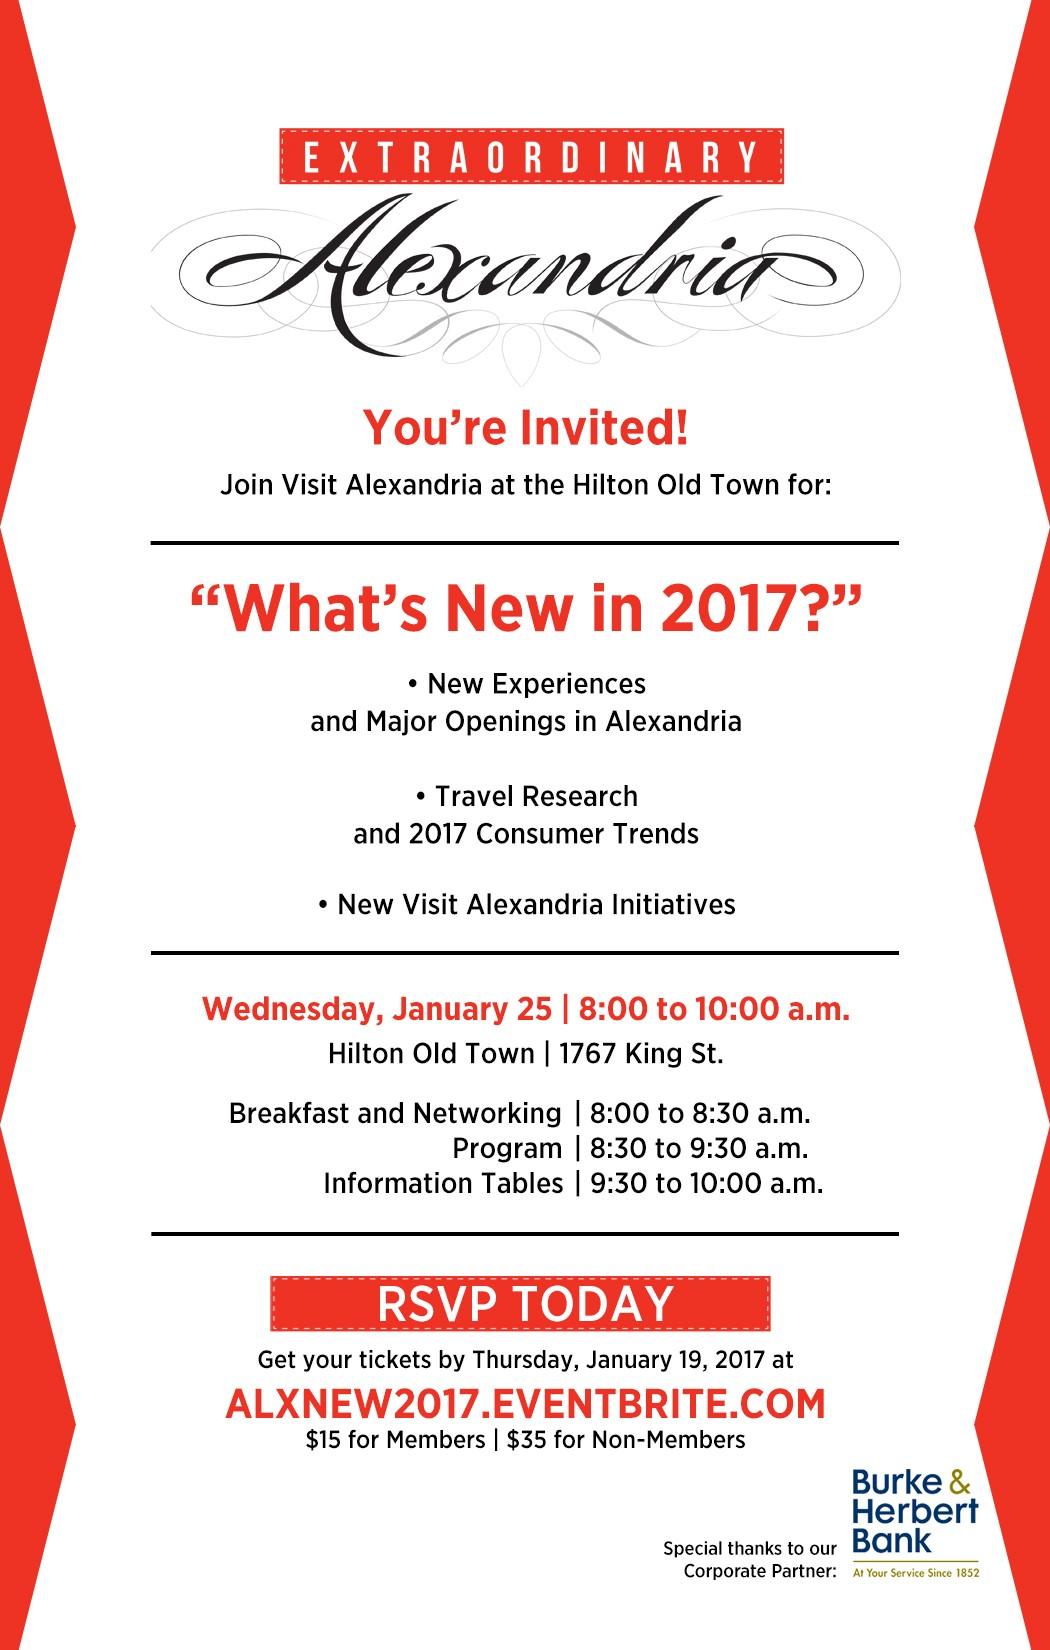 What's New invite 2017